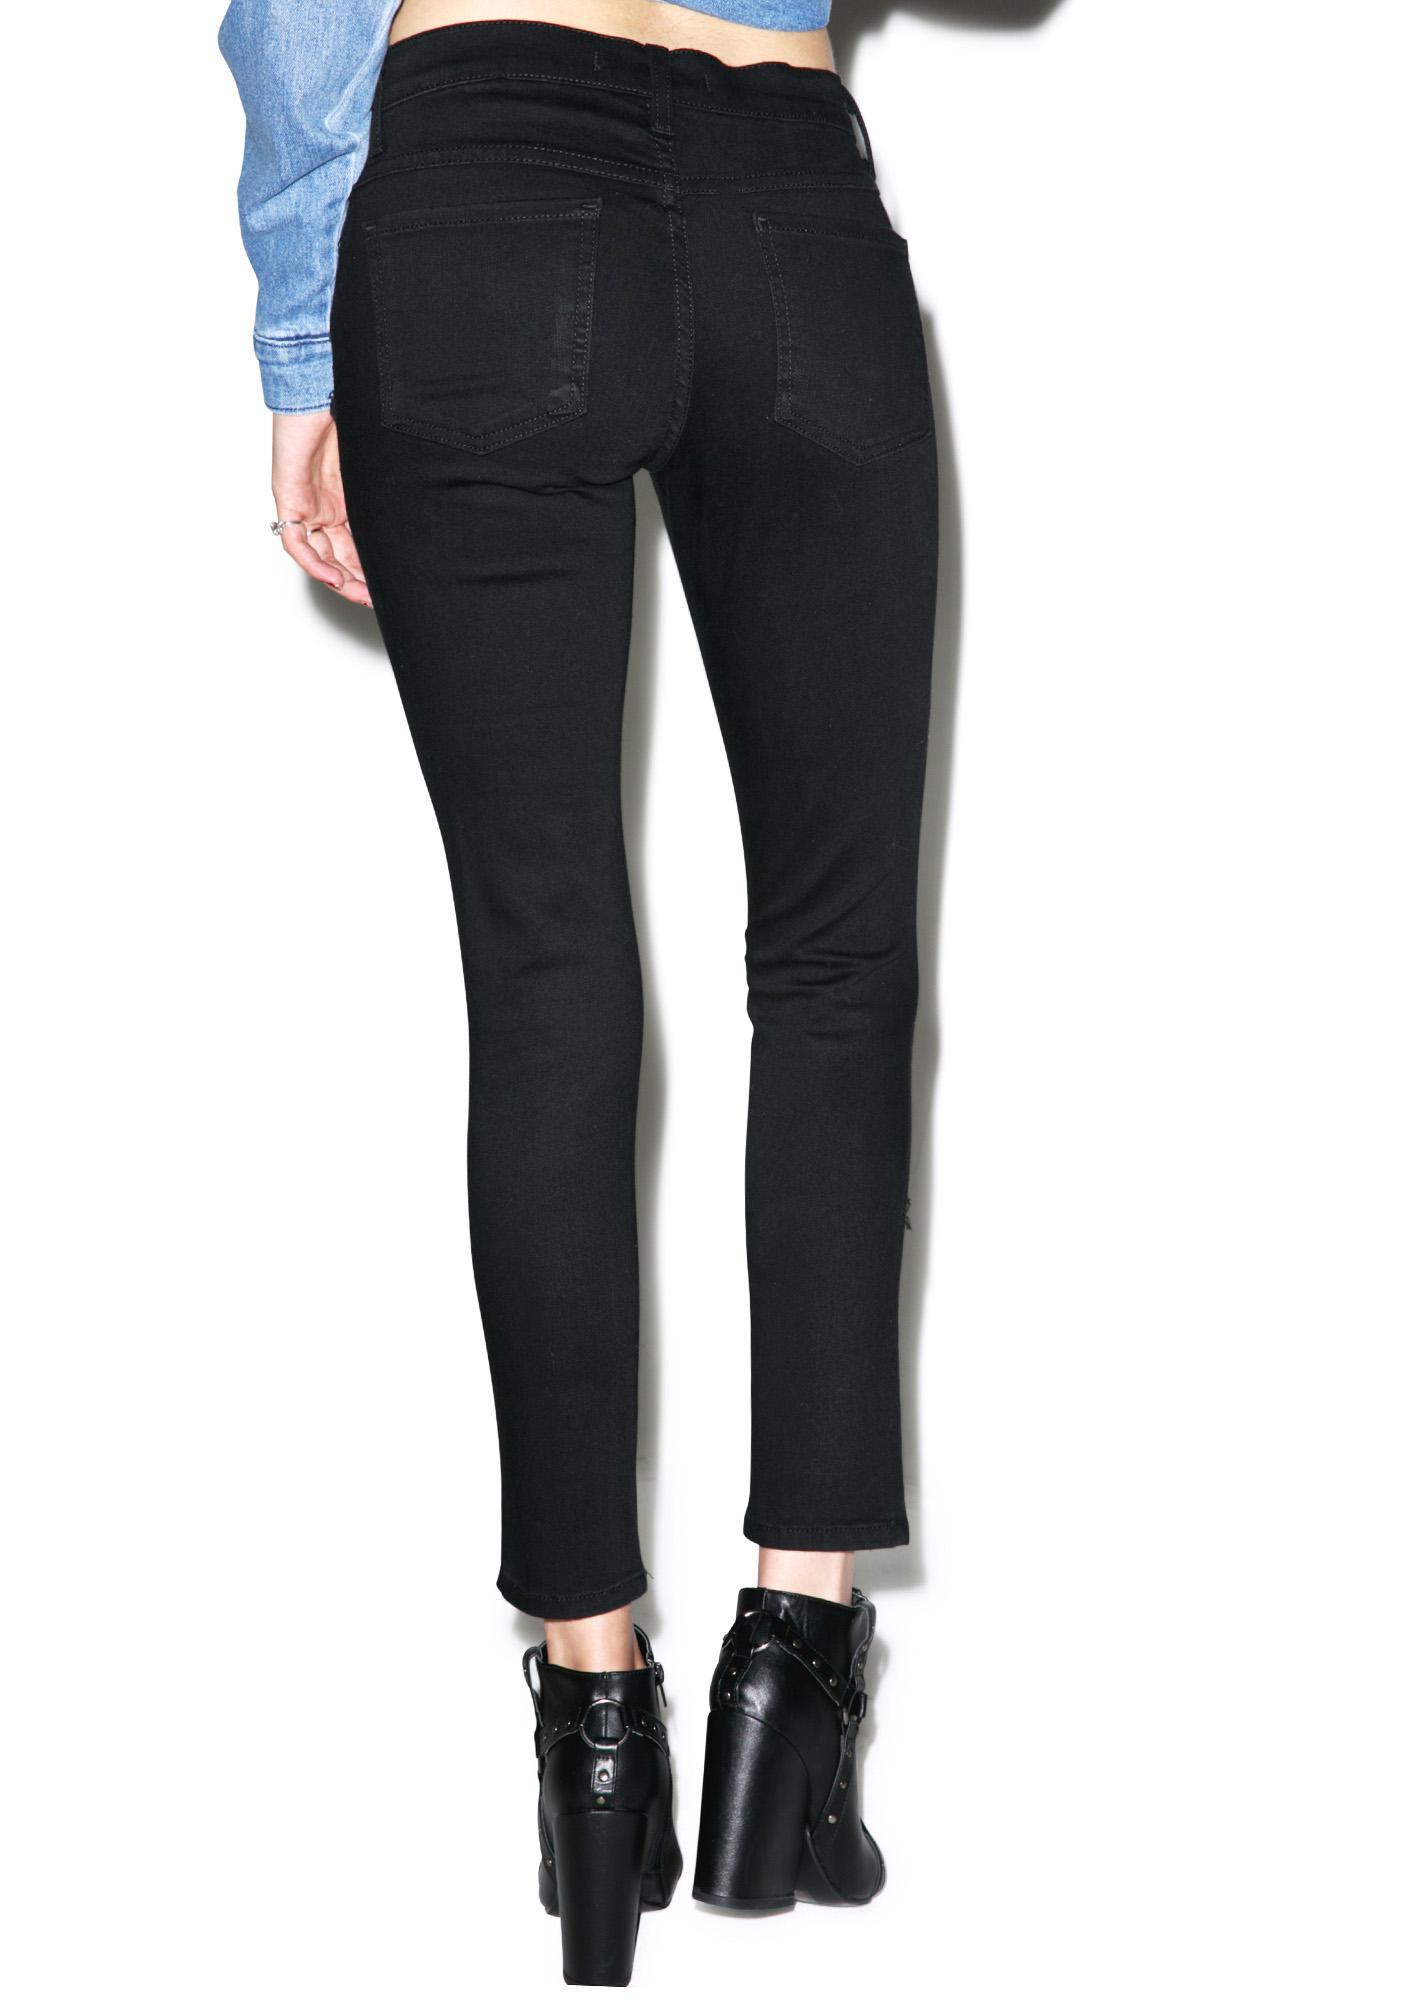 Cordelia Distressed Skinny Jeans